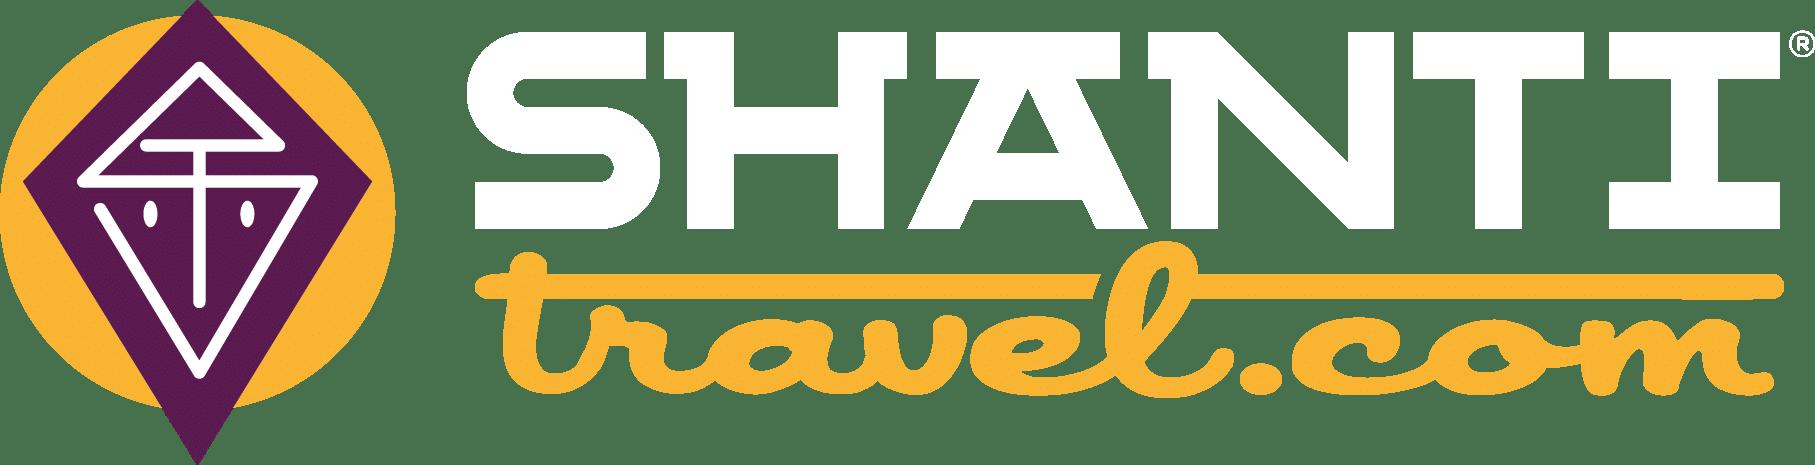 https://www.shantitravel.com/fr/voyage-sur-mesure